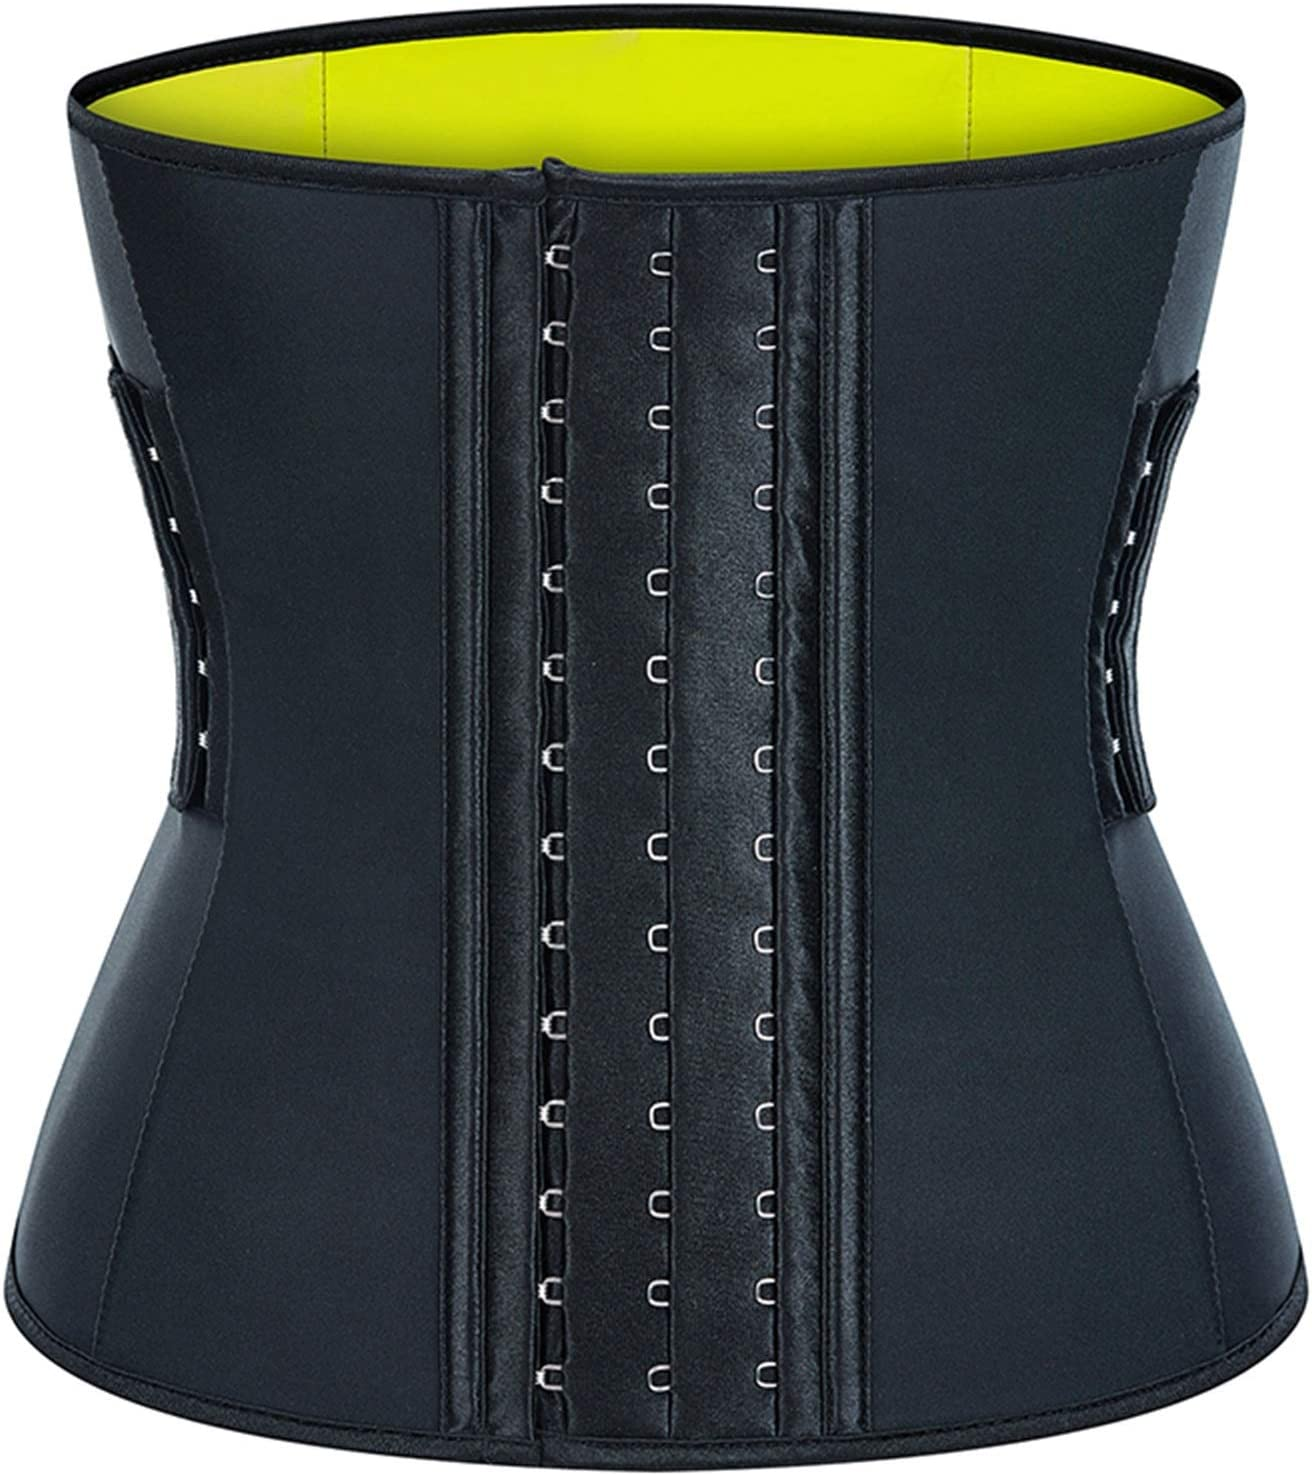 XCYY Waist Trainer Corset Belly Slim Ranking TOP19 free shipping U Body Belt Slimming Shaper